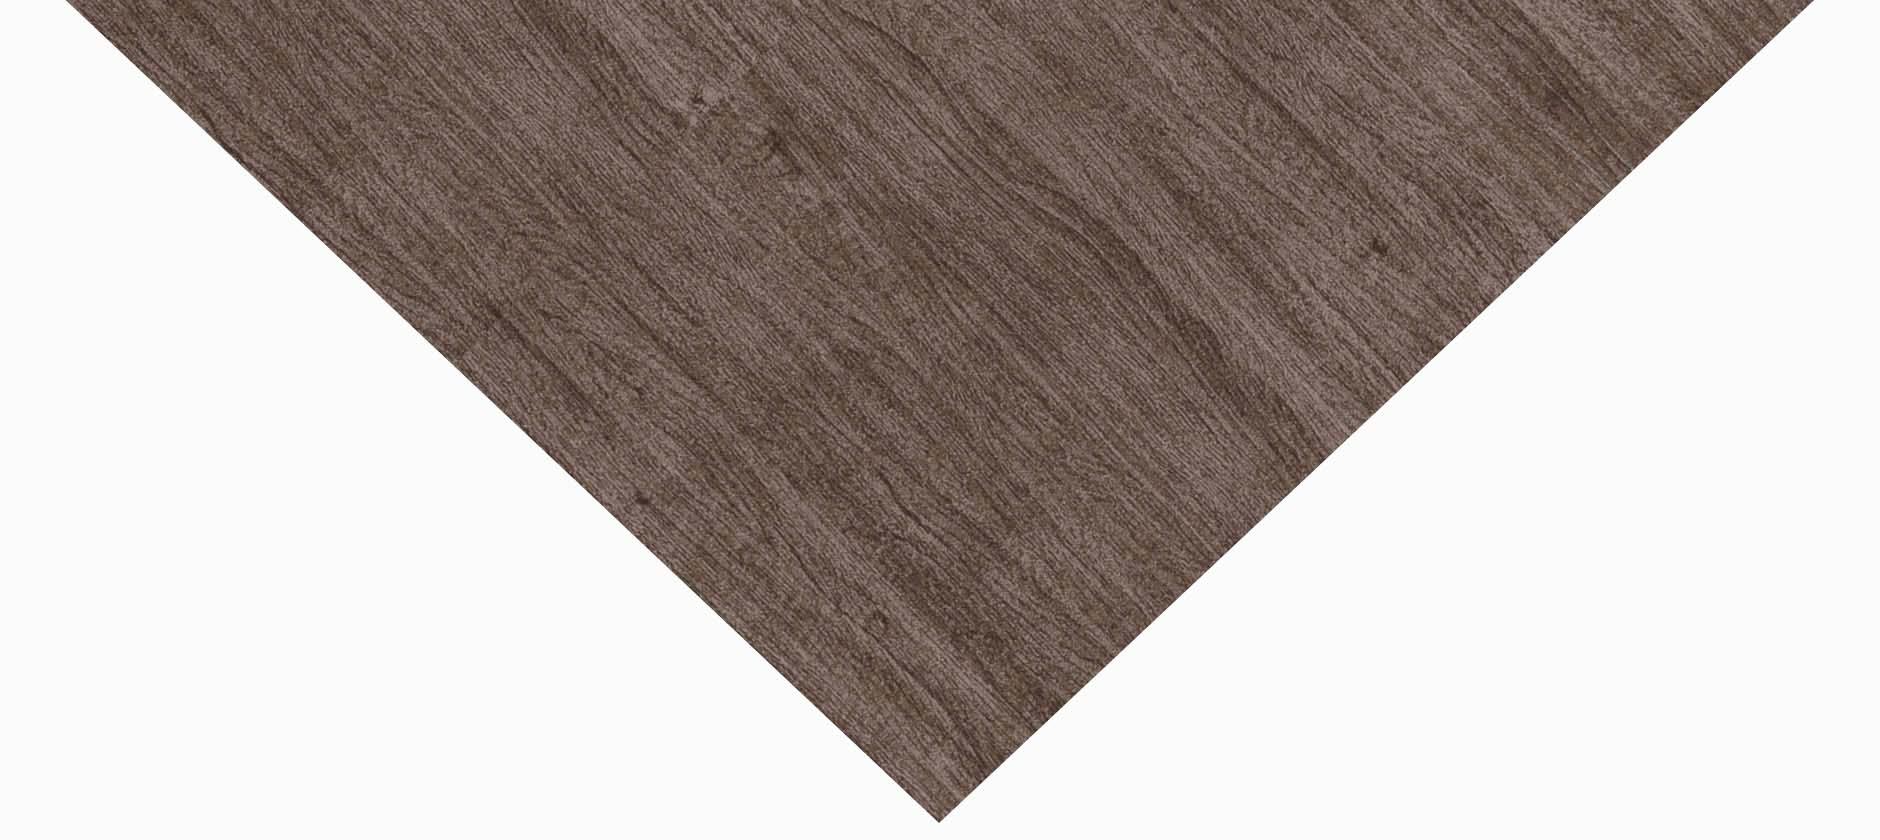 Madera marrón grisáceo